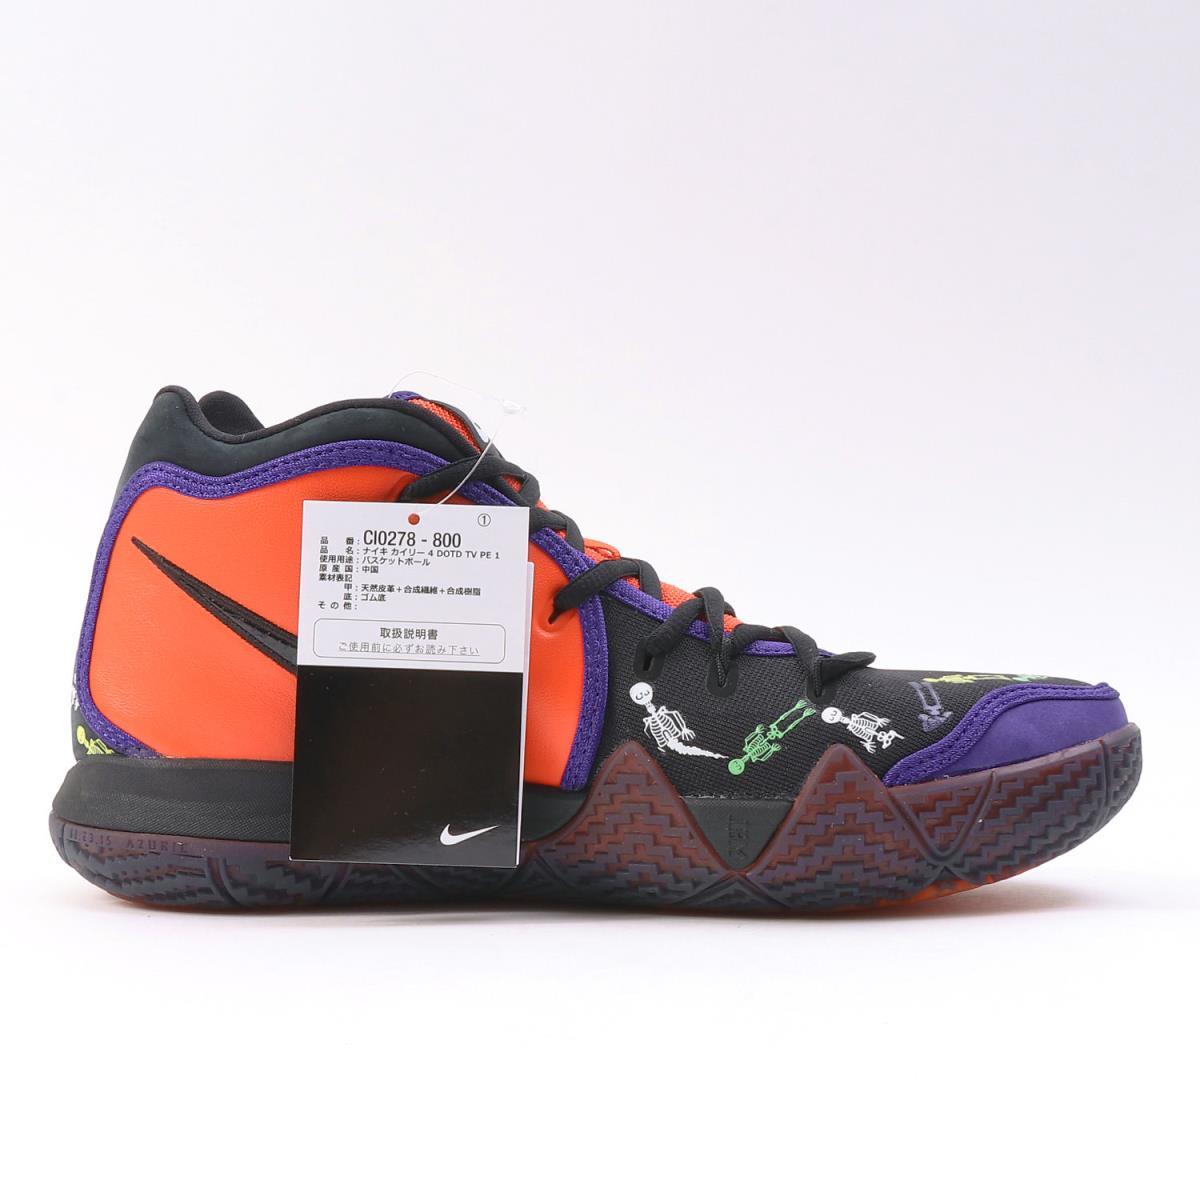 4fdd706d0f9 NIKE (Nike) KYRIE 4 DOTD TV PE 1 DAY OF THE DEAD (CI0278-800) team orange X  black US9(27cm)